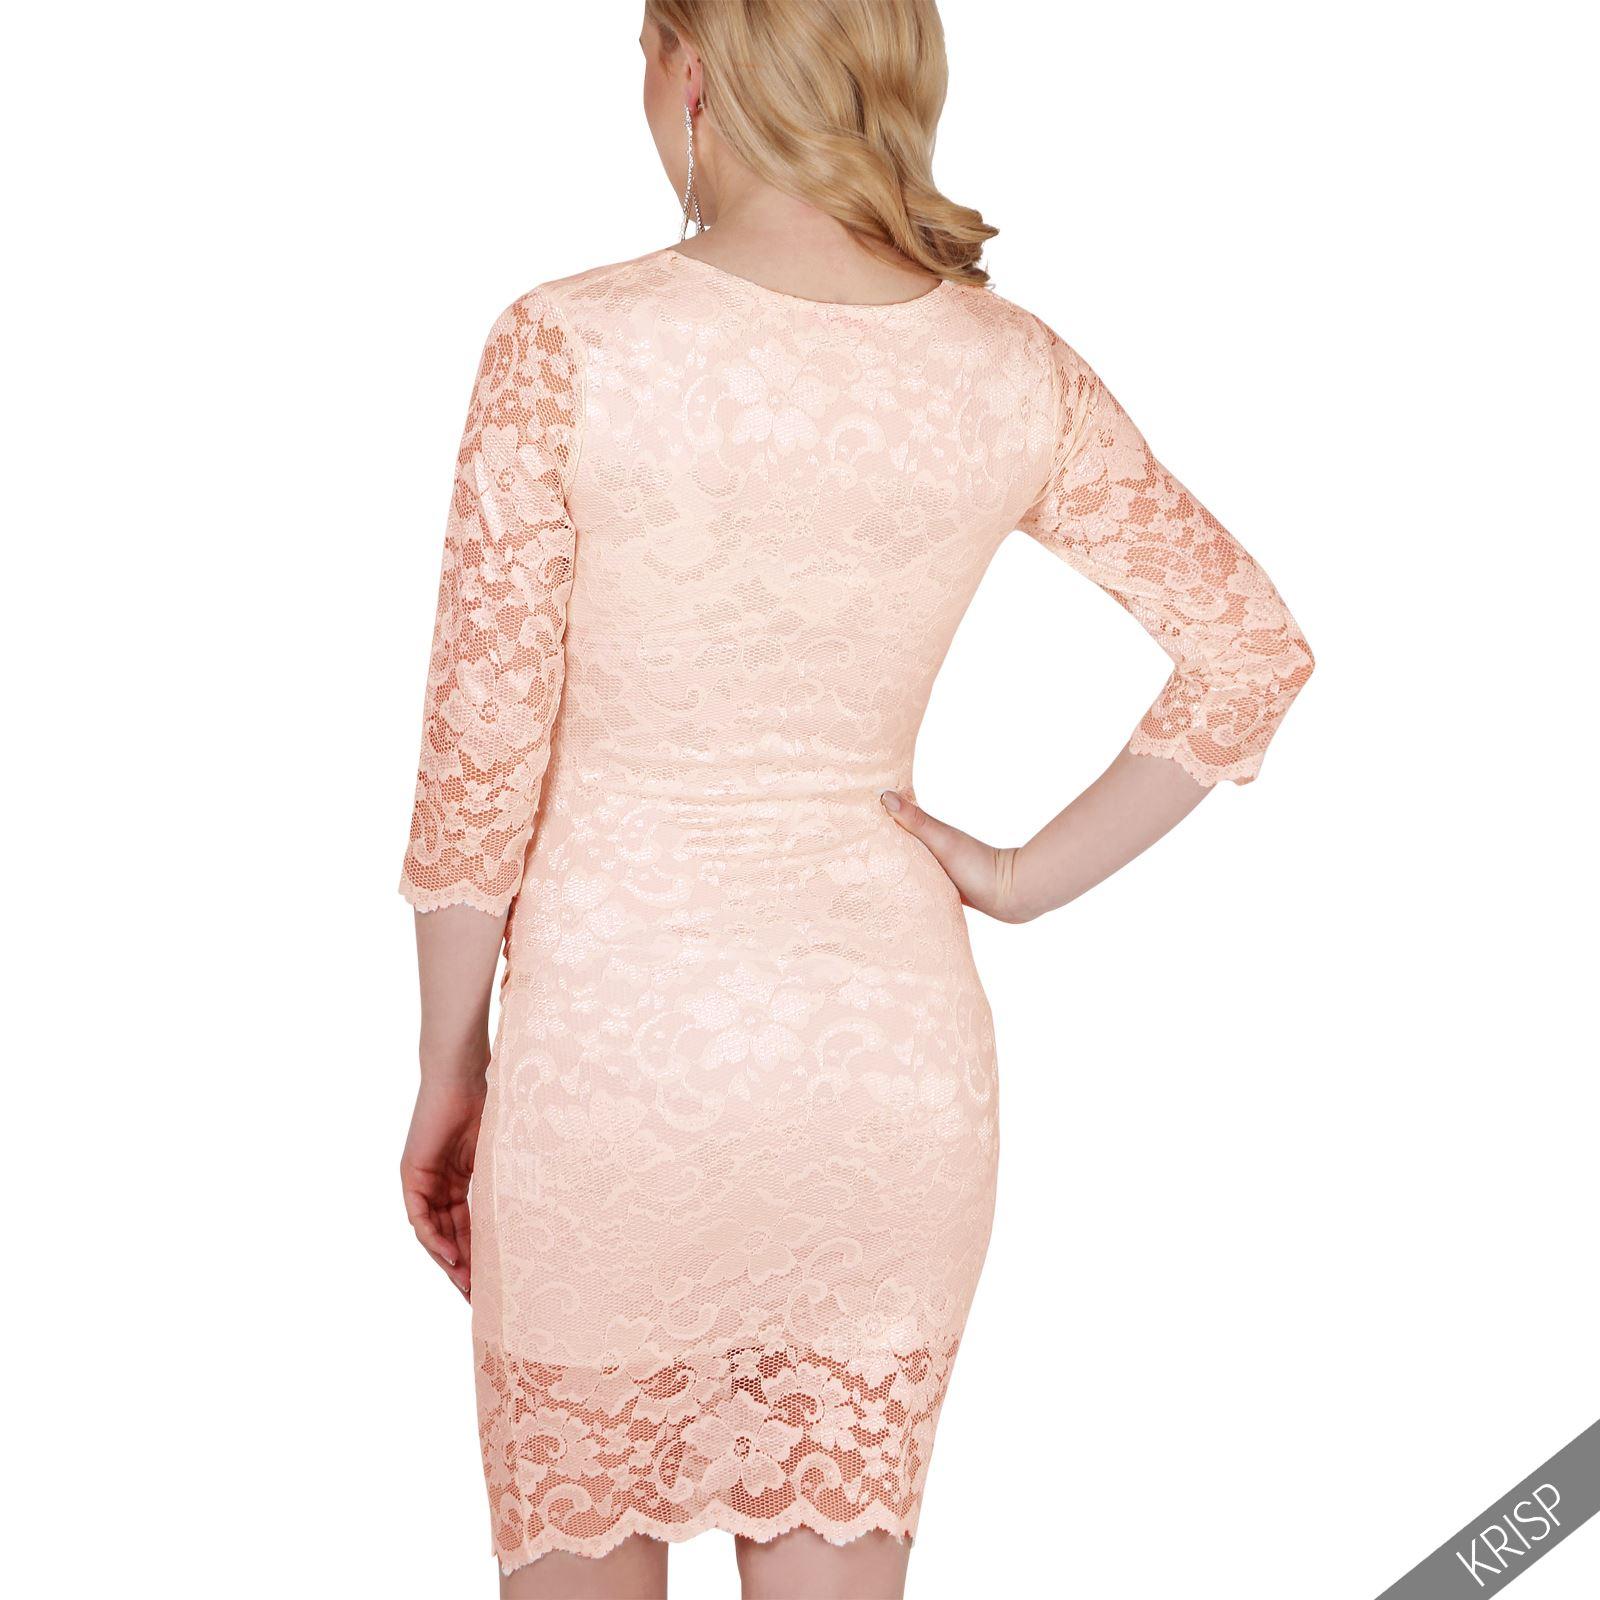 Maternity Retro Lace Stretch Bodycon Pregnancy Midi Dress Party ...